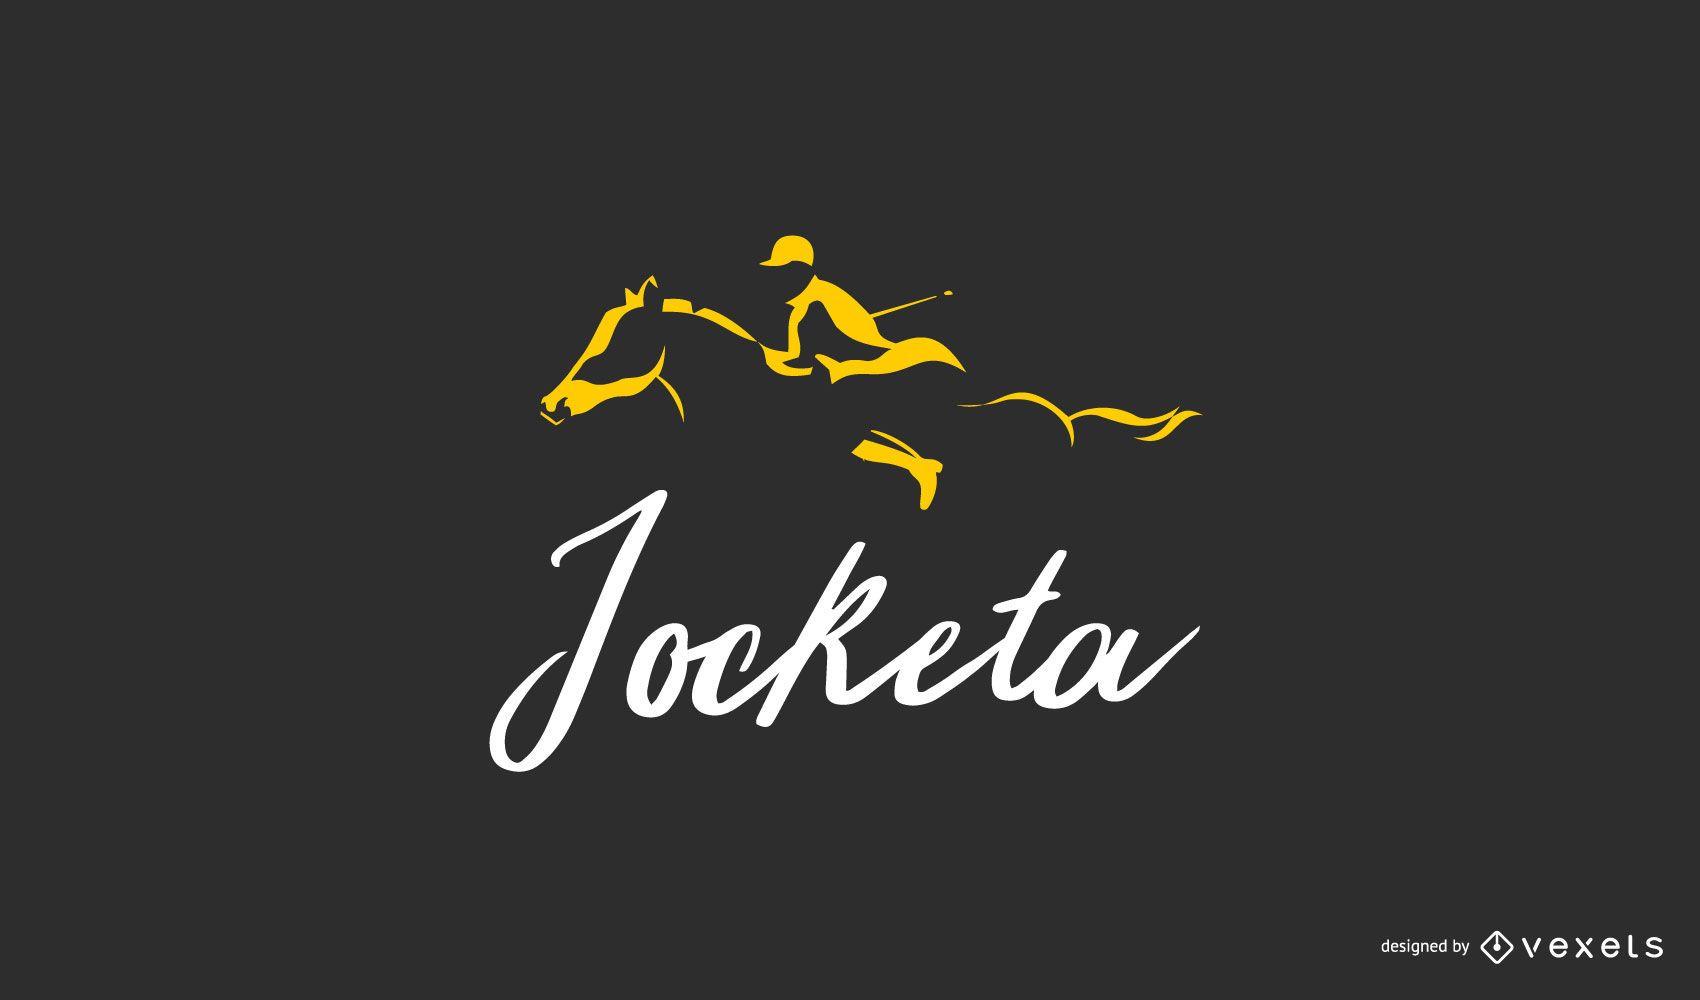 Logotipo da Jockey